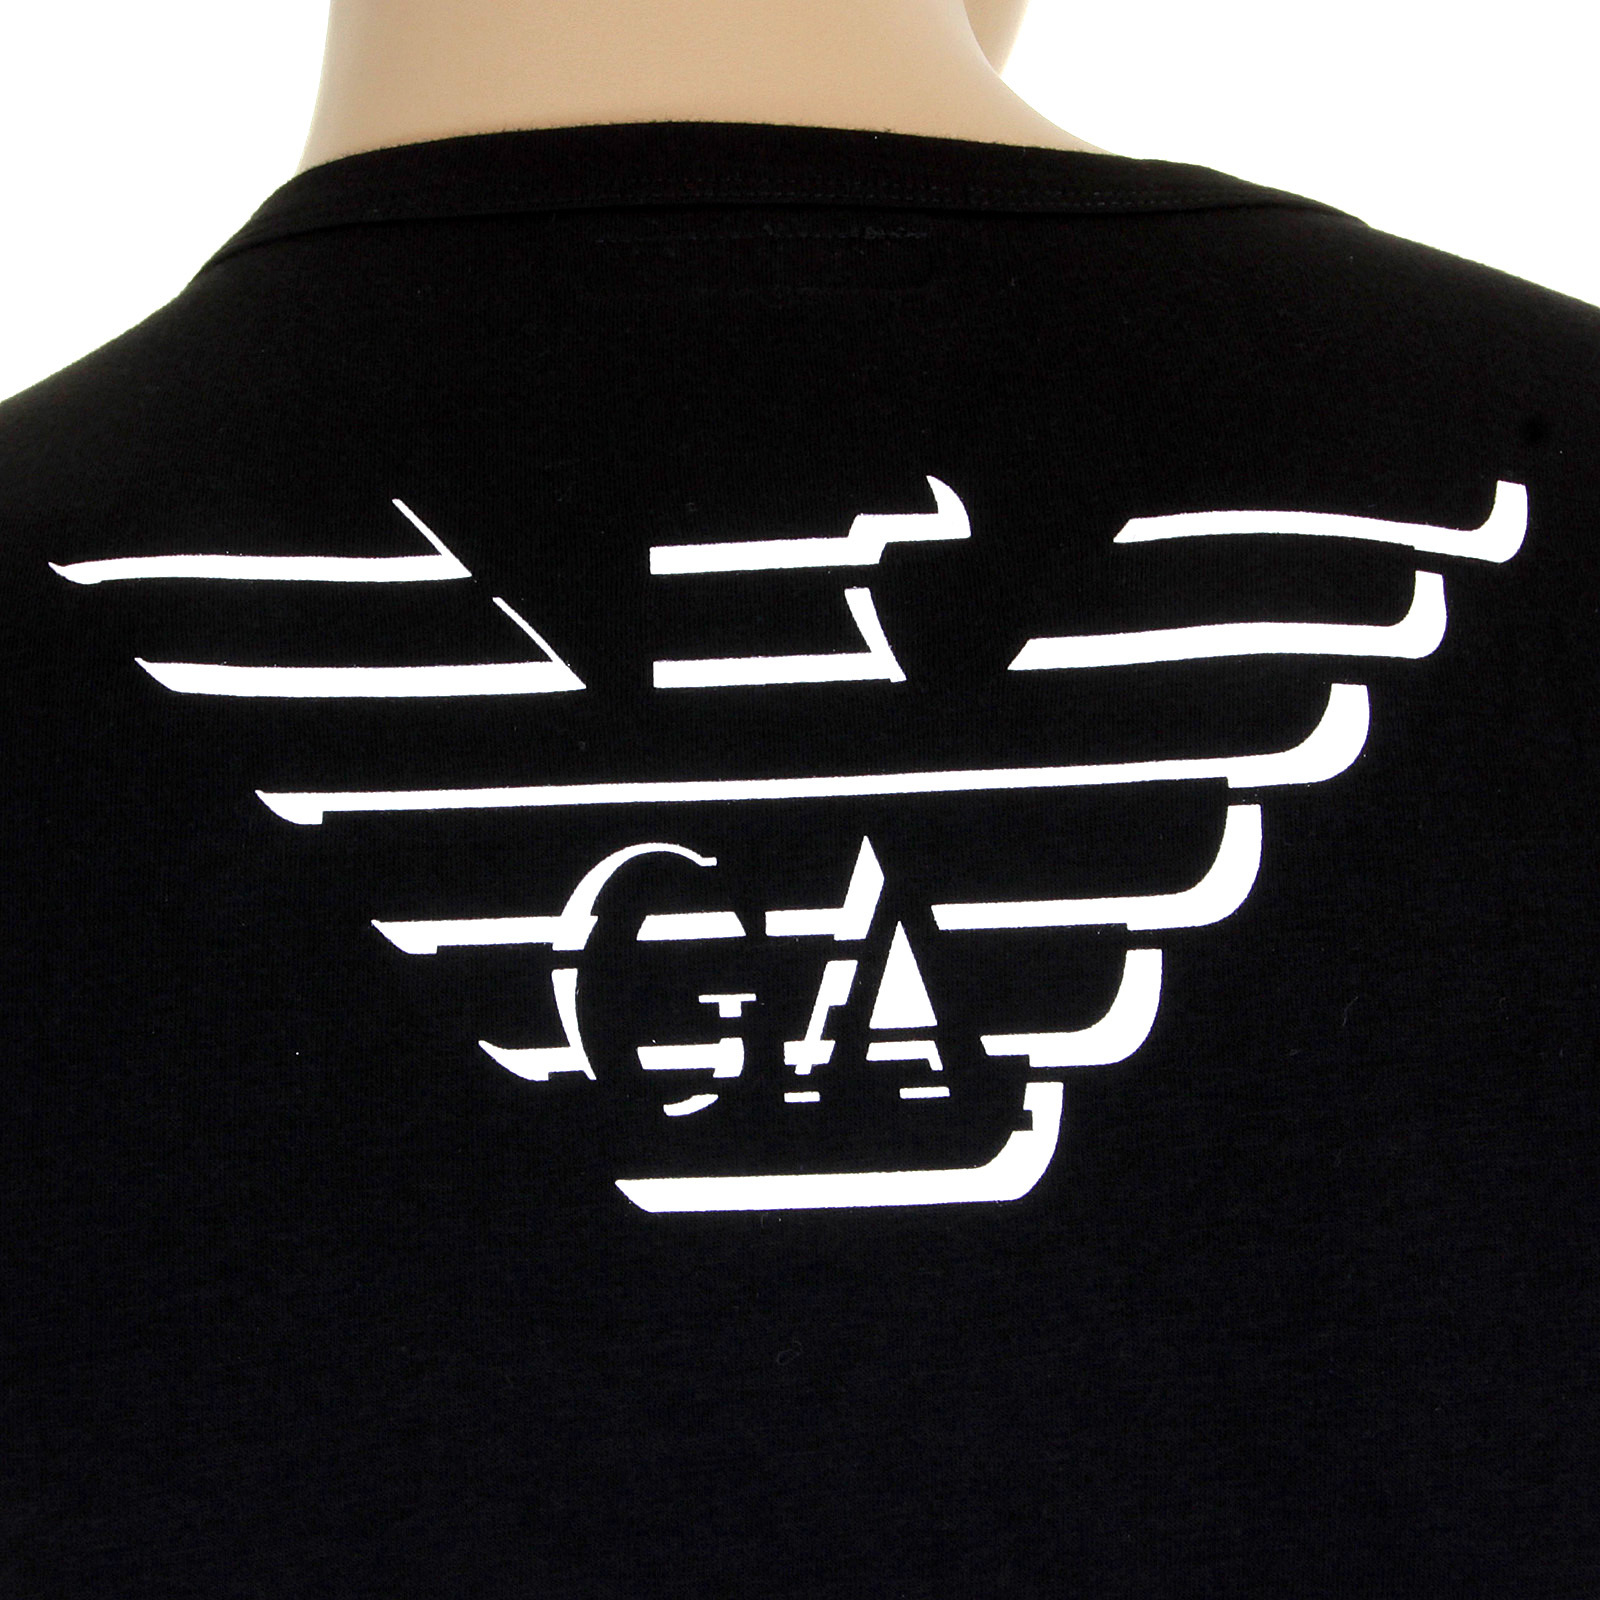 7e89d9080501b Emporio Armani black v neck t shirt 110752 1S512 EAM1505 at Togged ...